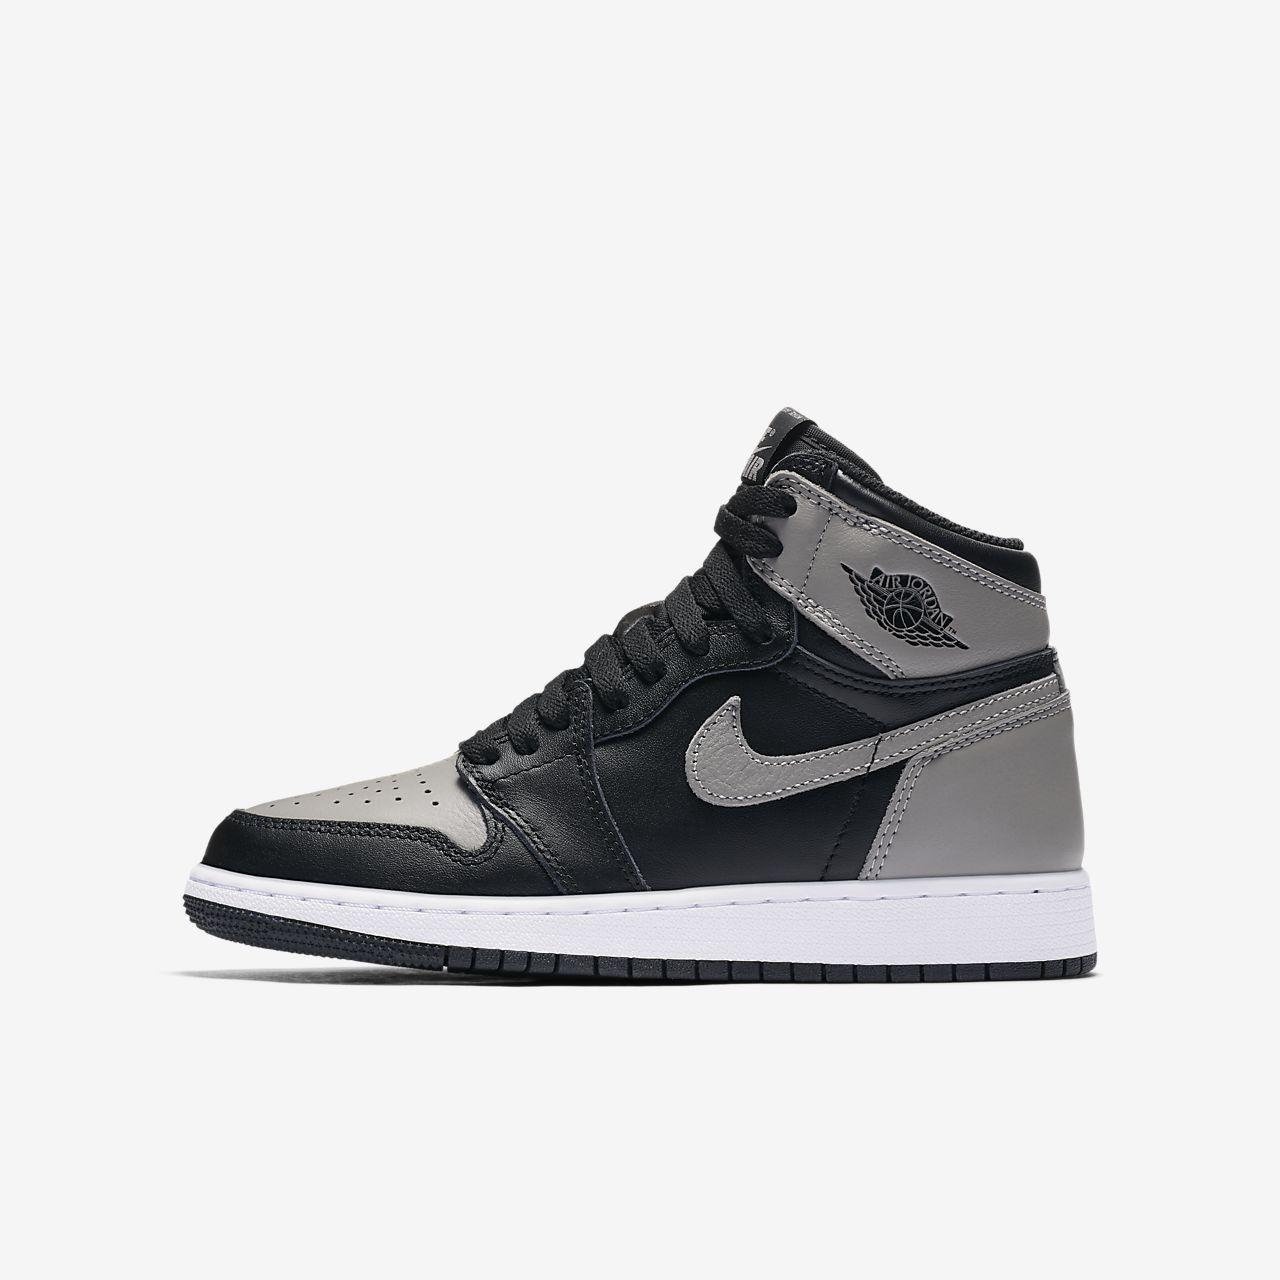 new arrival 4ac3d d916c Chaussures Nike Nike Nike Air Jordan I Retro High Premium Gs Ydtrry 040e2a